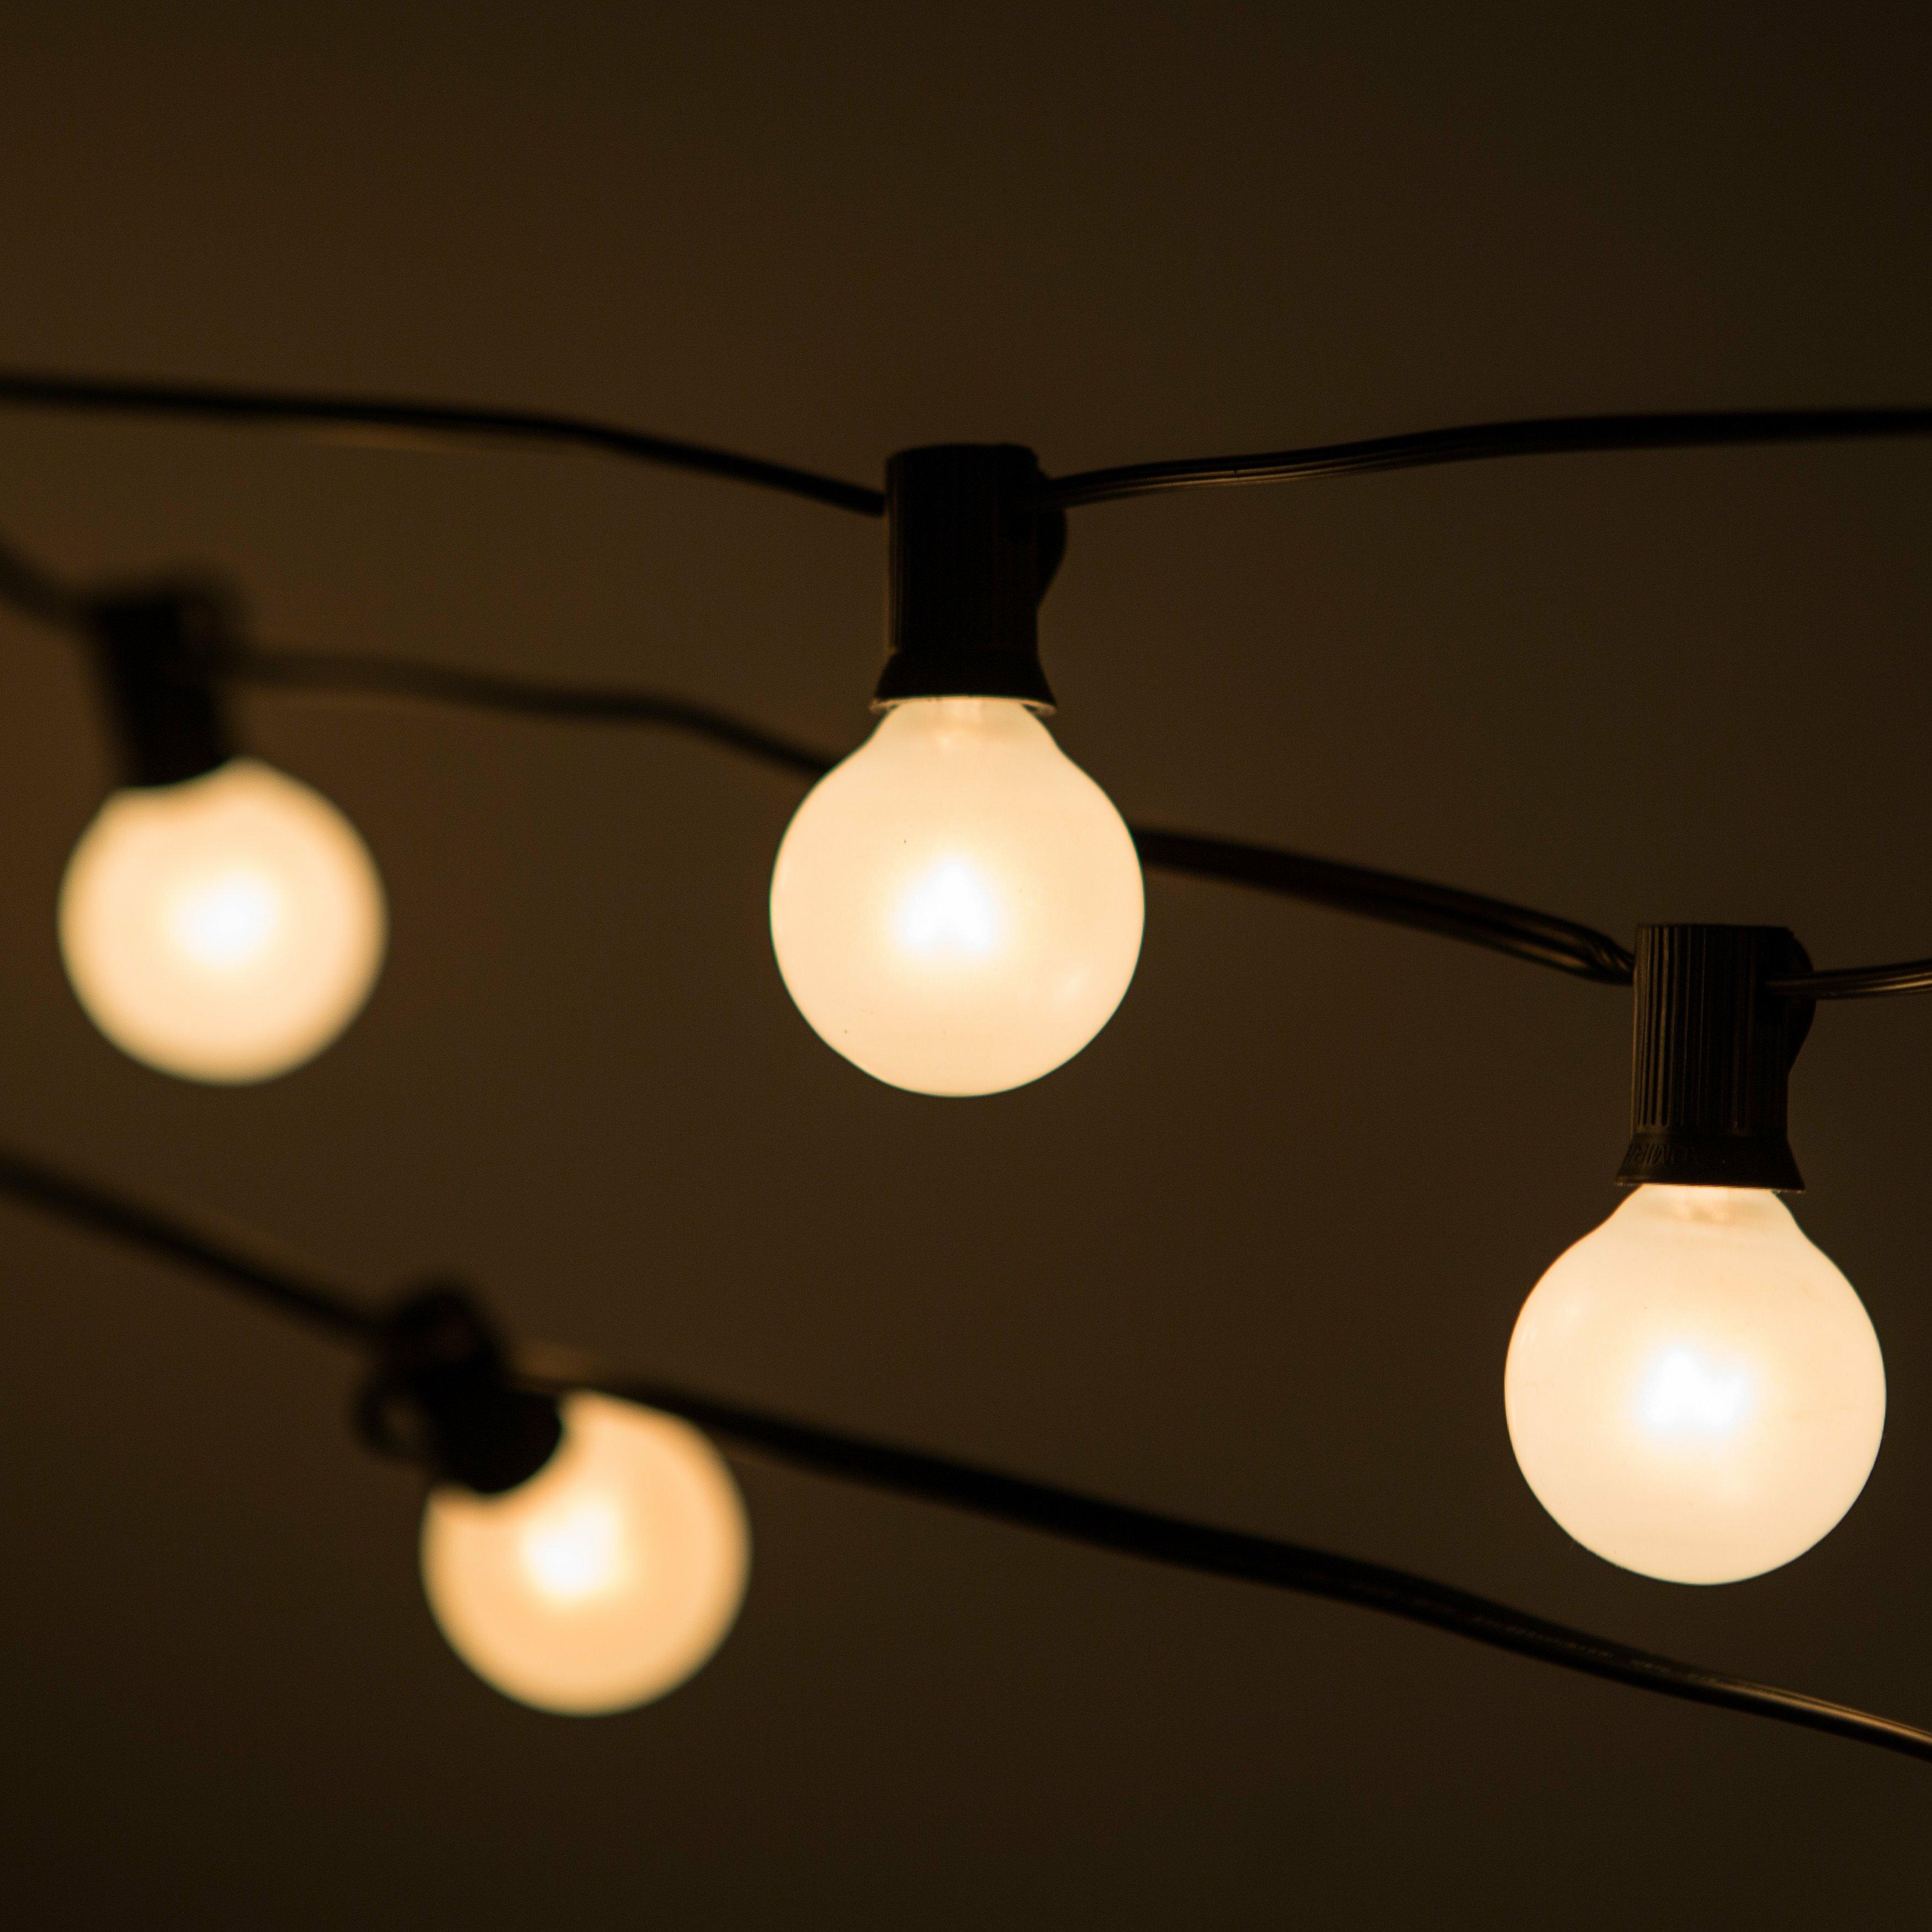 HometownEvolutionInc 50-Light Globe String Lights & Reviews Wayfair